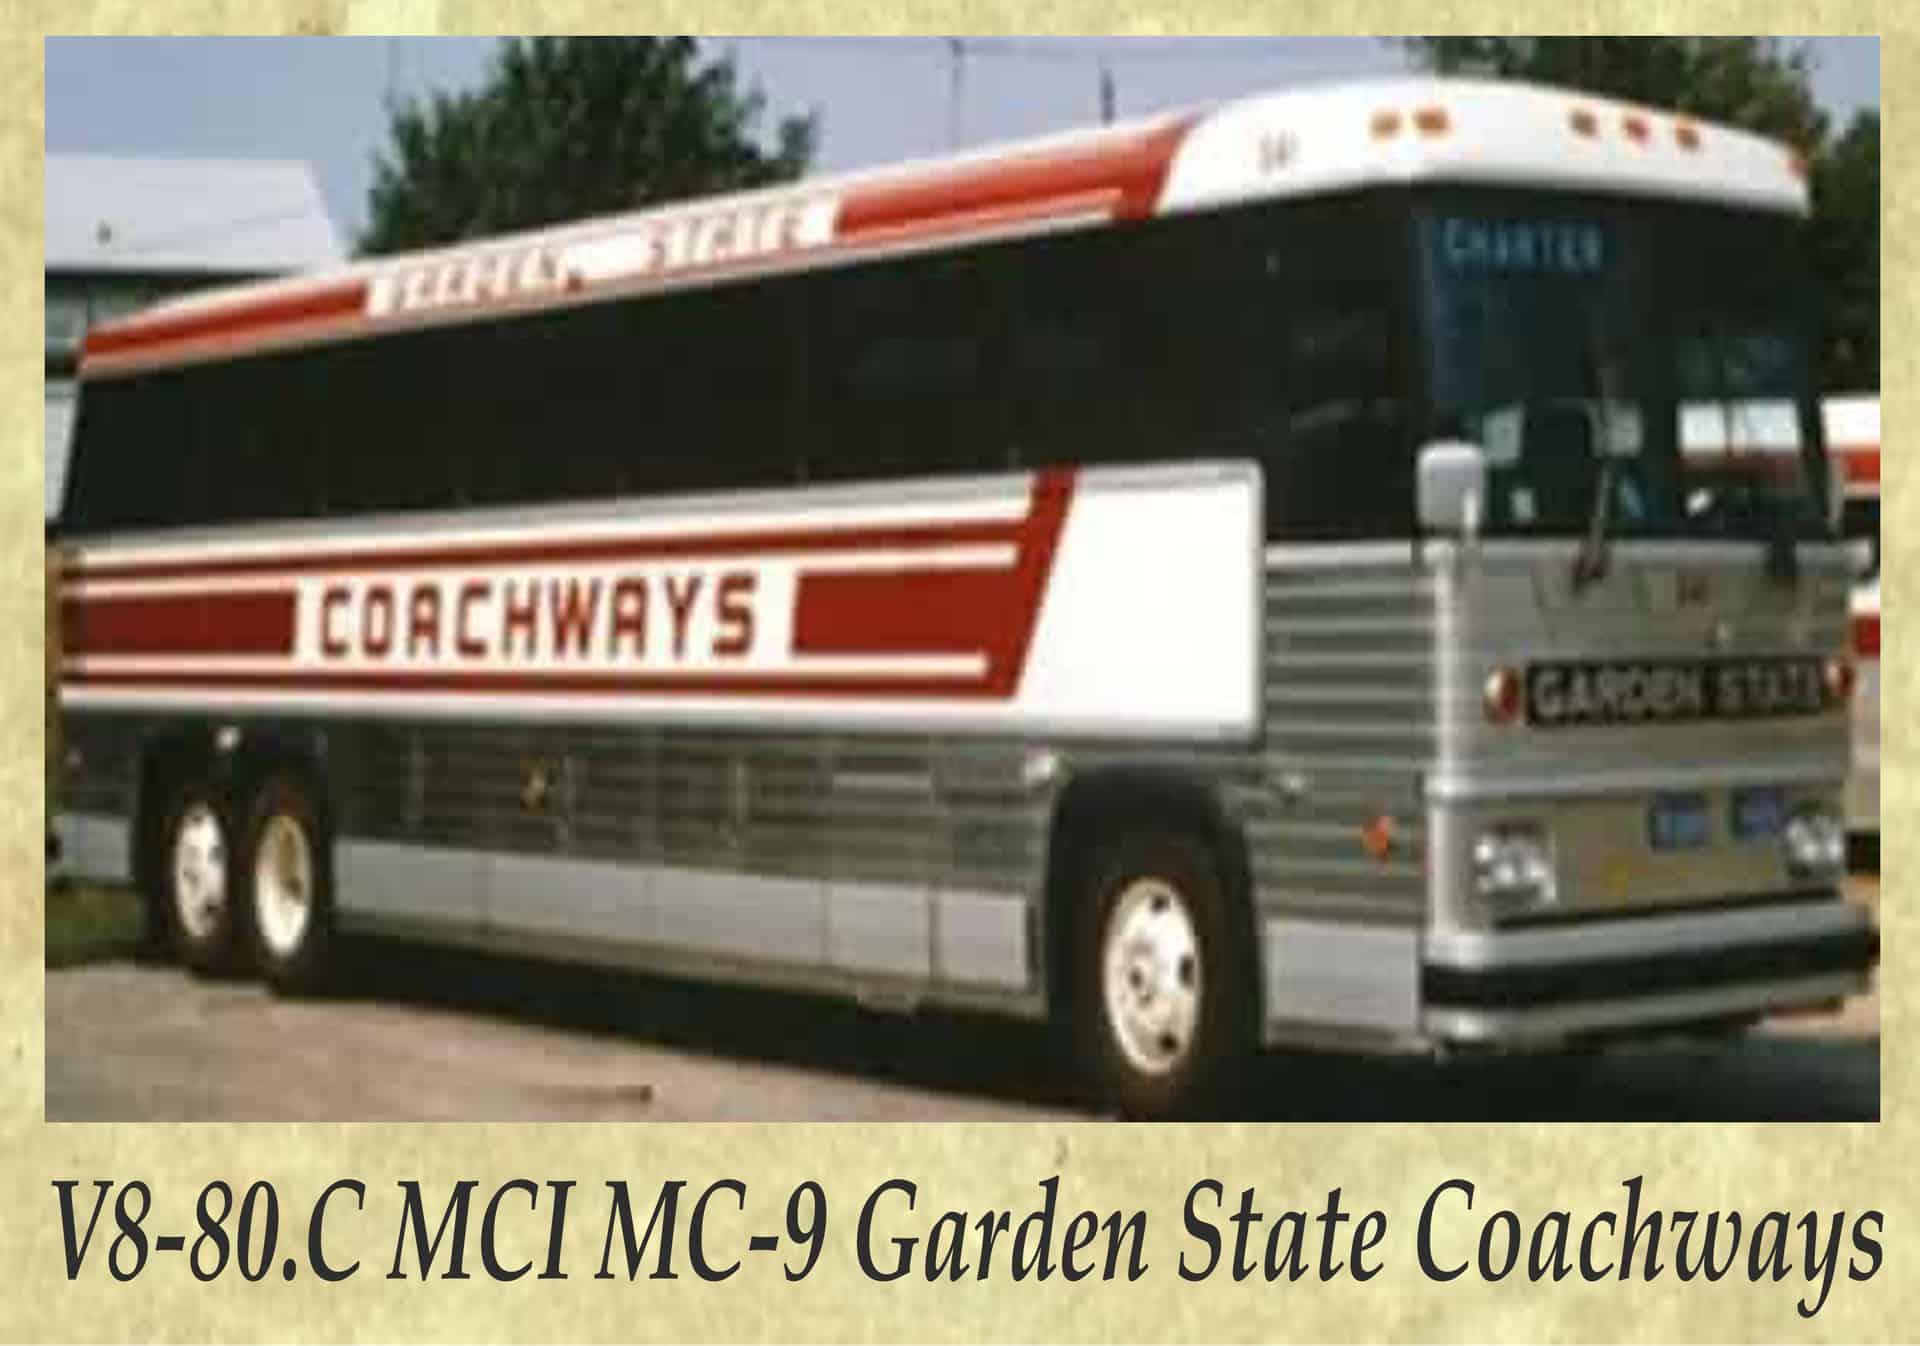 V8-80.C MCI MC-9 Garden State Coachways